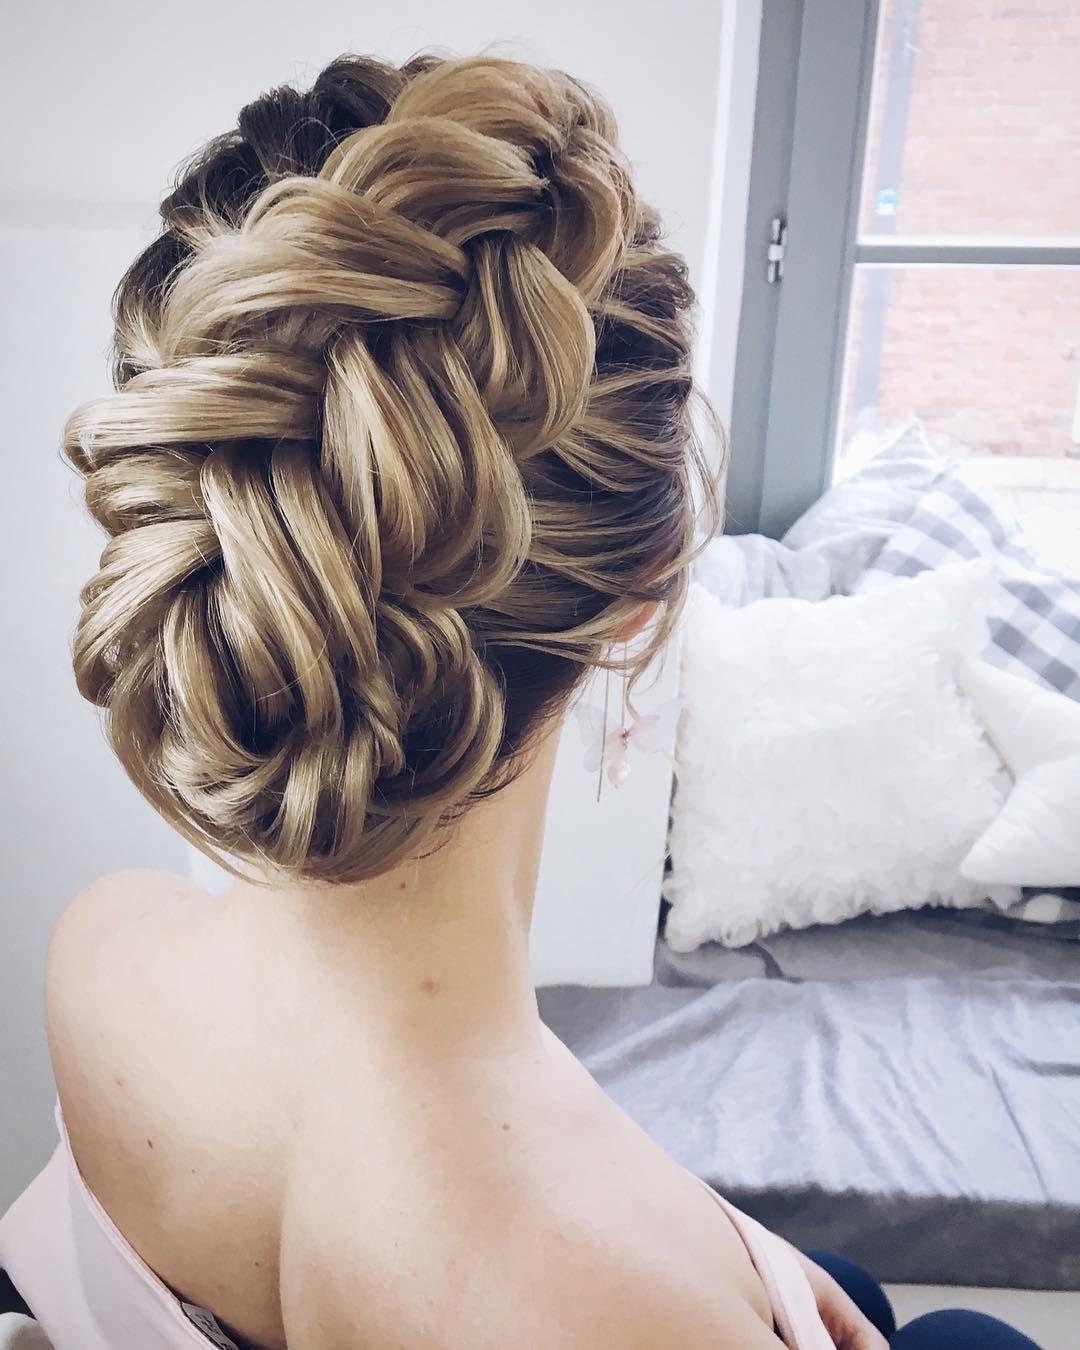 Textured wedding updo hairstyle ,messy updo wedding